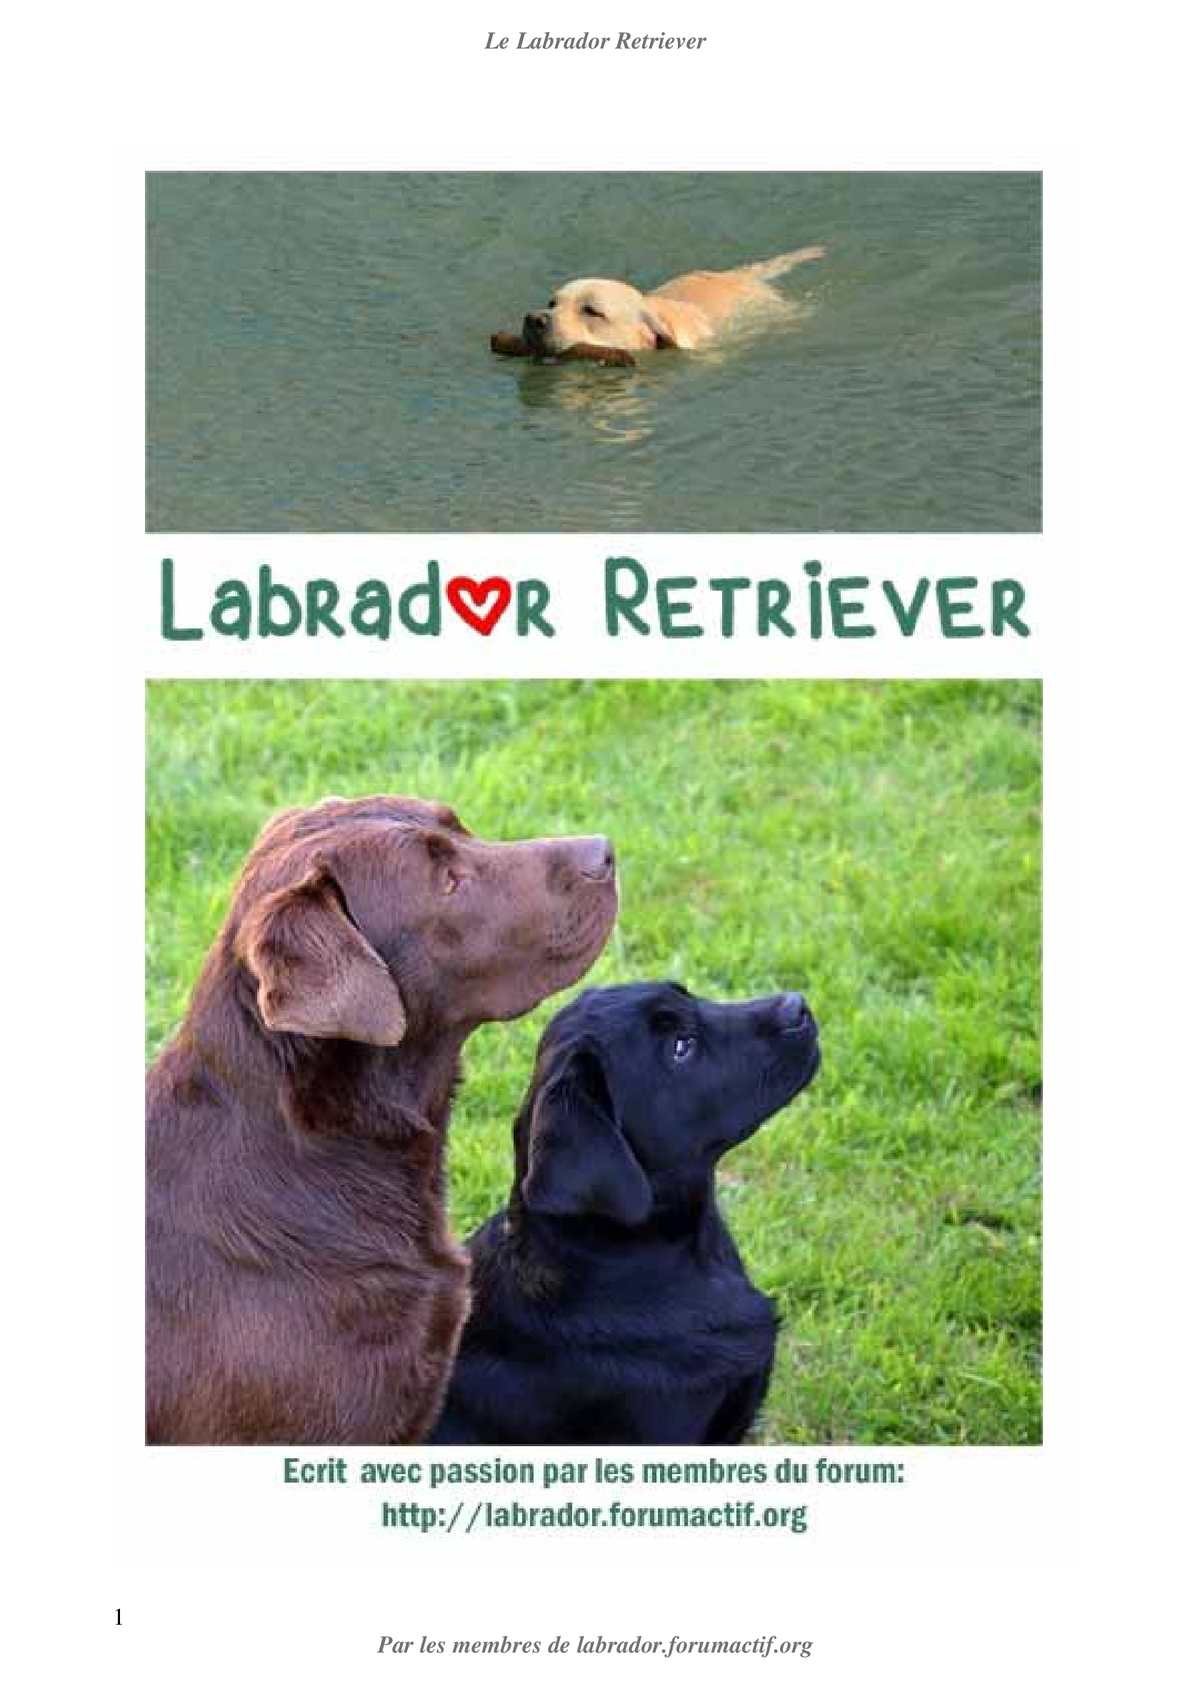 Le Labrador Tome Ii Calaméo Retriever f6I7vYbgy